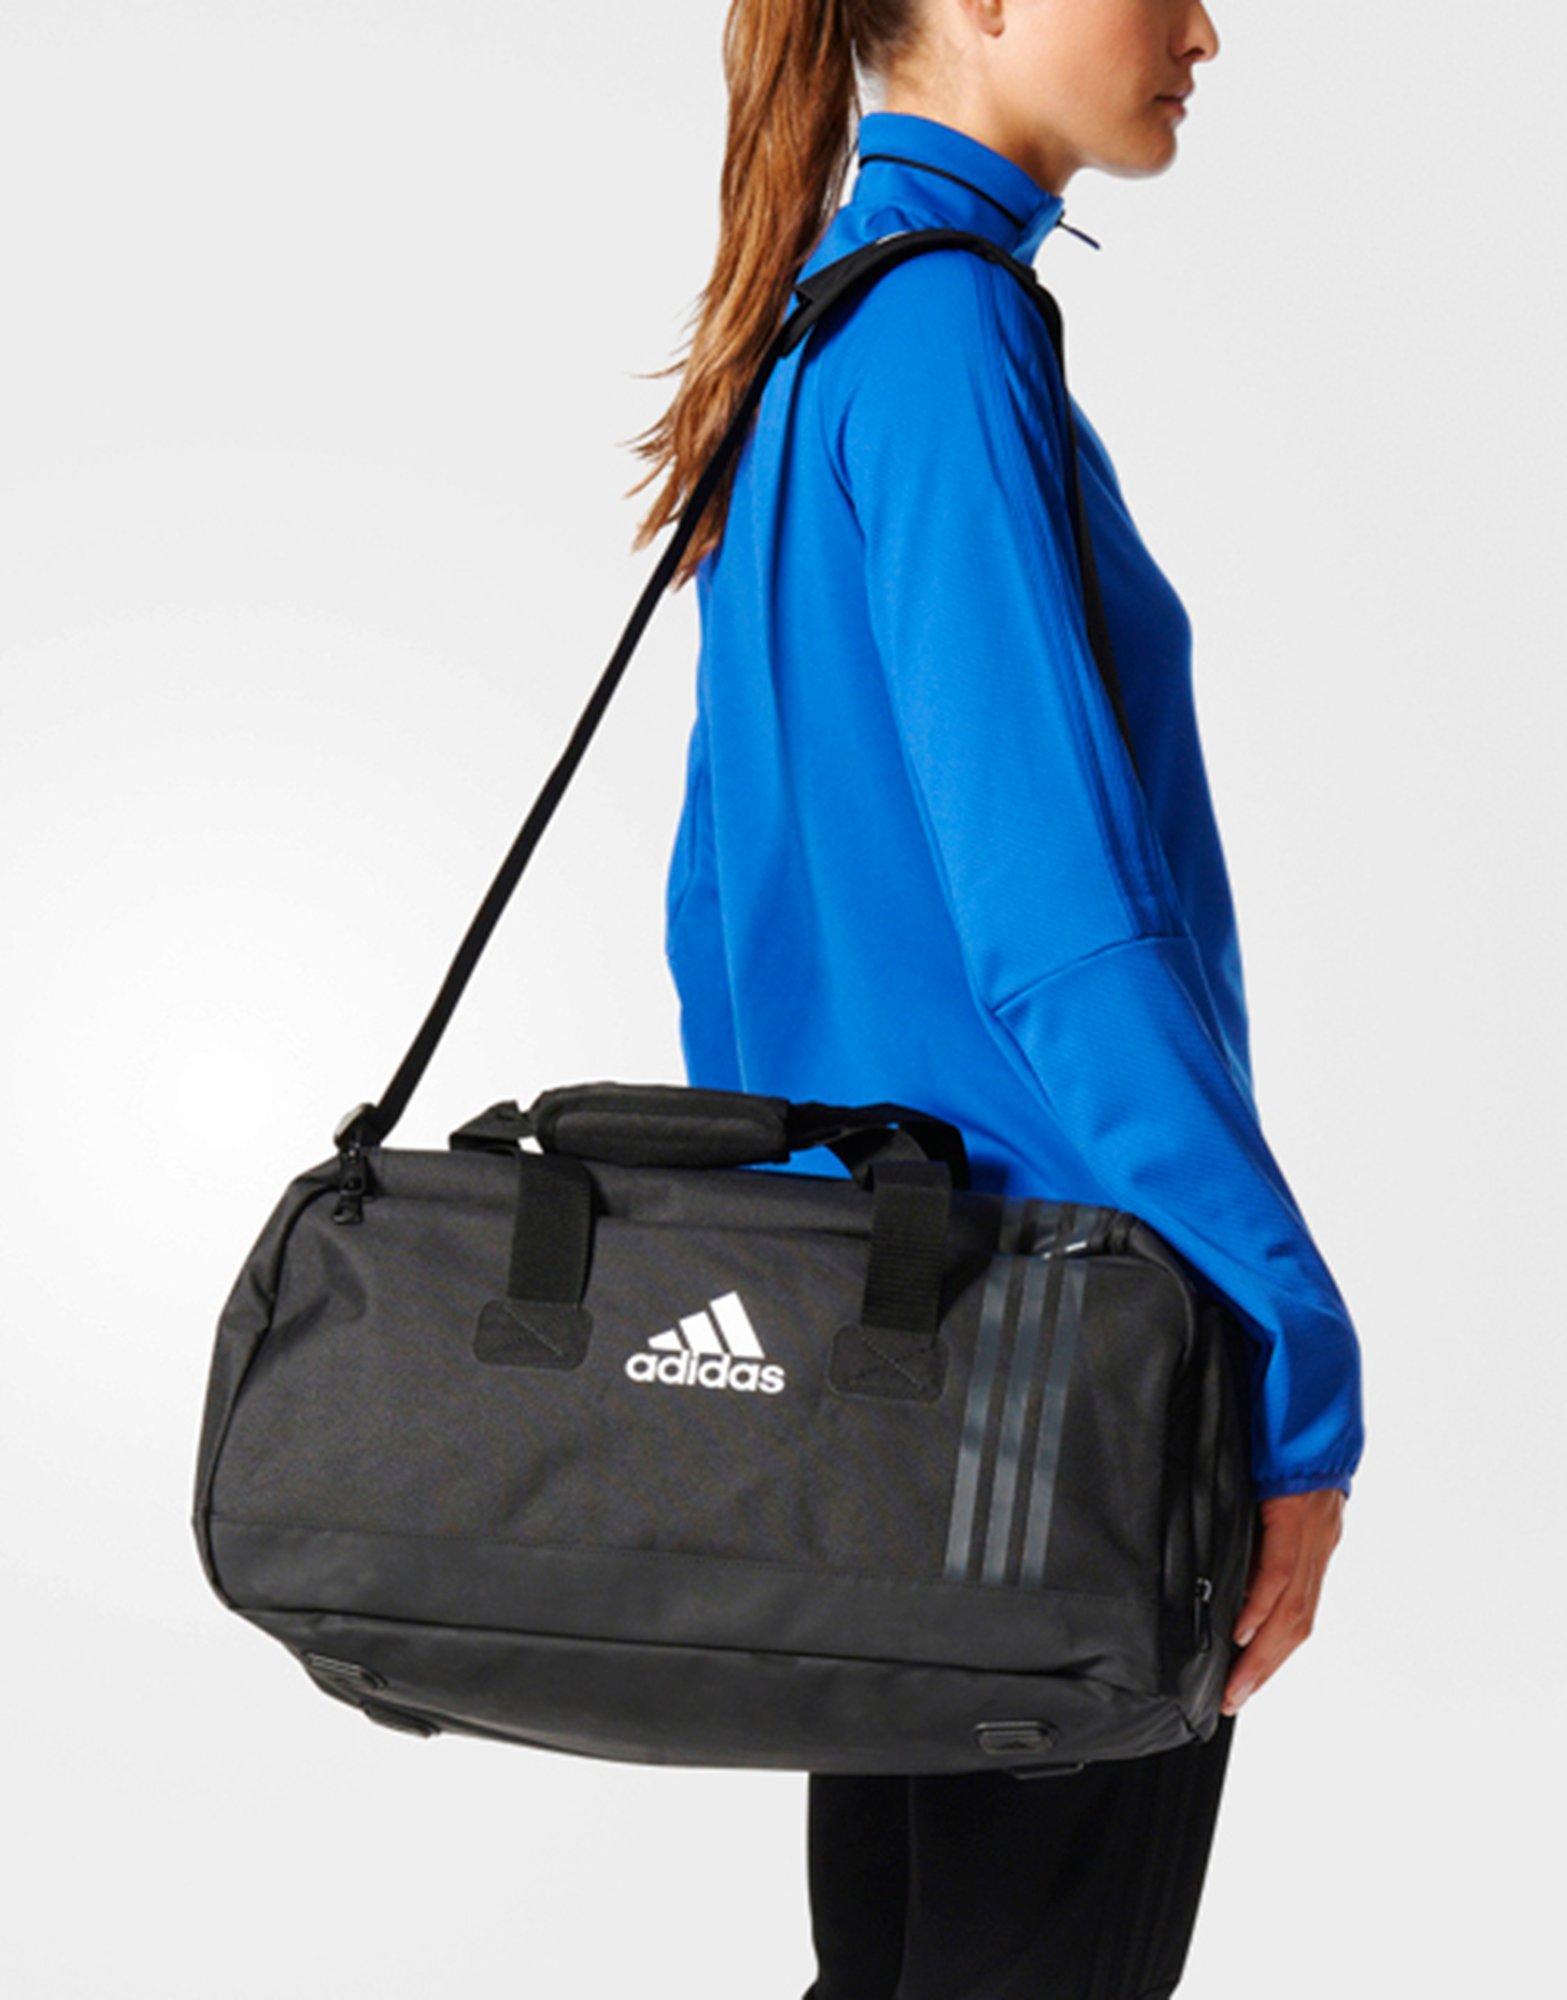 c38278a05574 adidas Tiro Team Bag Small in Black - Lyst